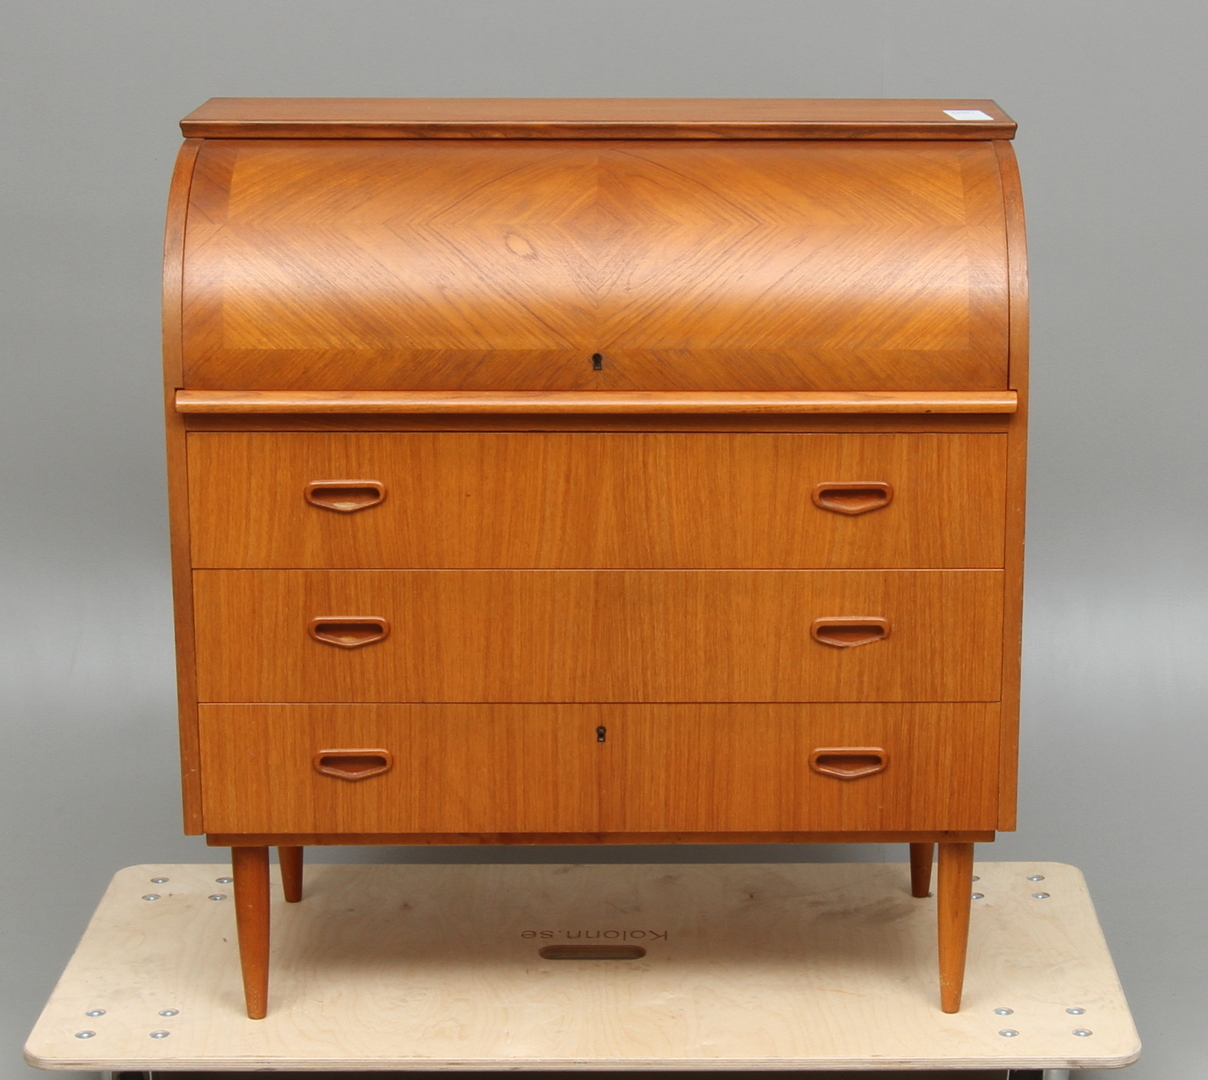 bilder f r 23981 sekret r teak 1900 talets mitt. Black Bedroom Furniture Sets. Home Design Ideas